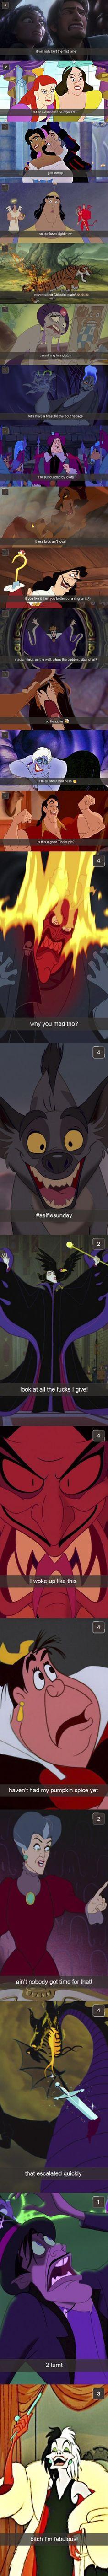 Disney Villain Snapchats